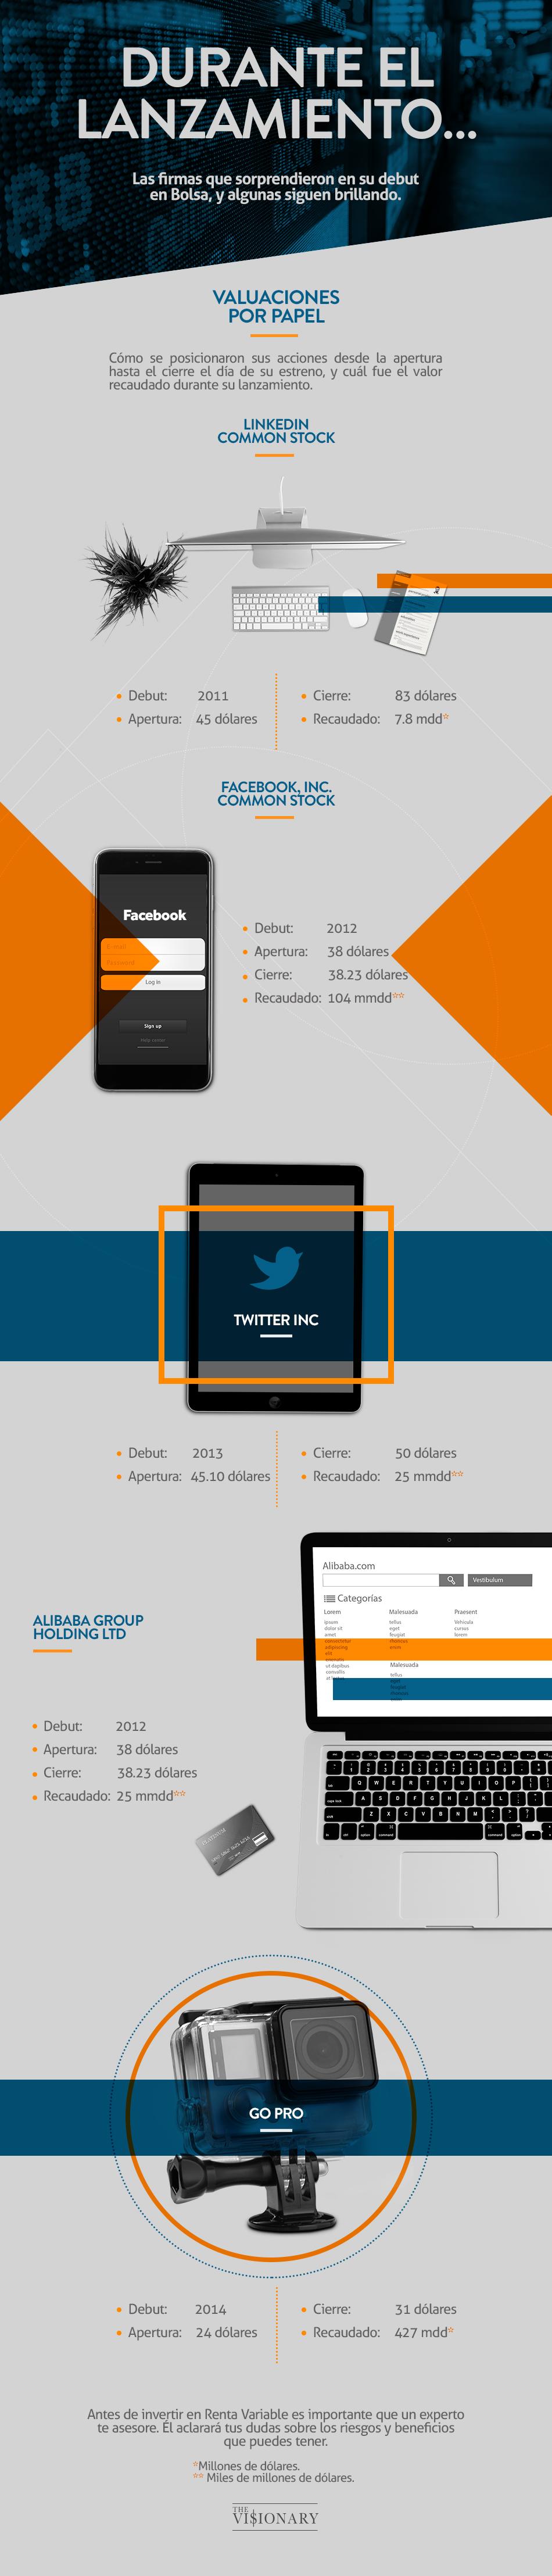 The-Visionary-Finamex-deslumbrantes-debuts-en-bolsa-Infografia